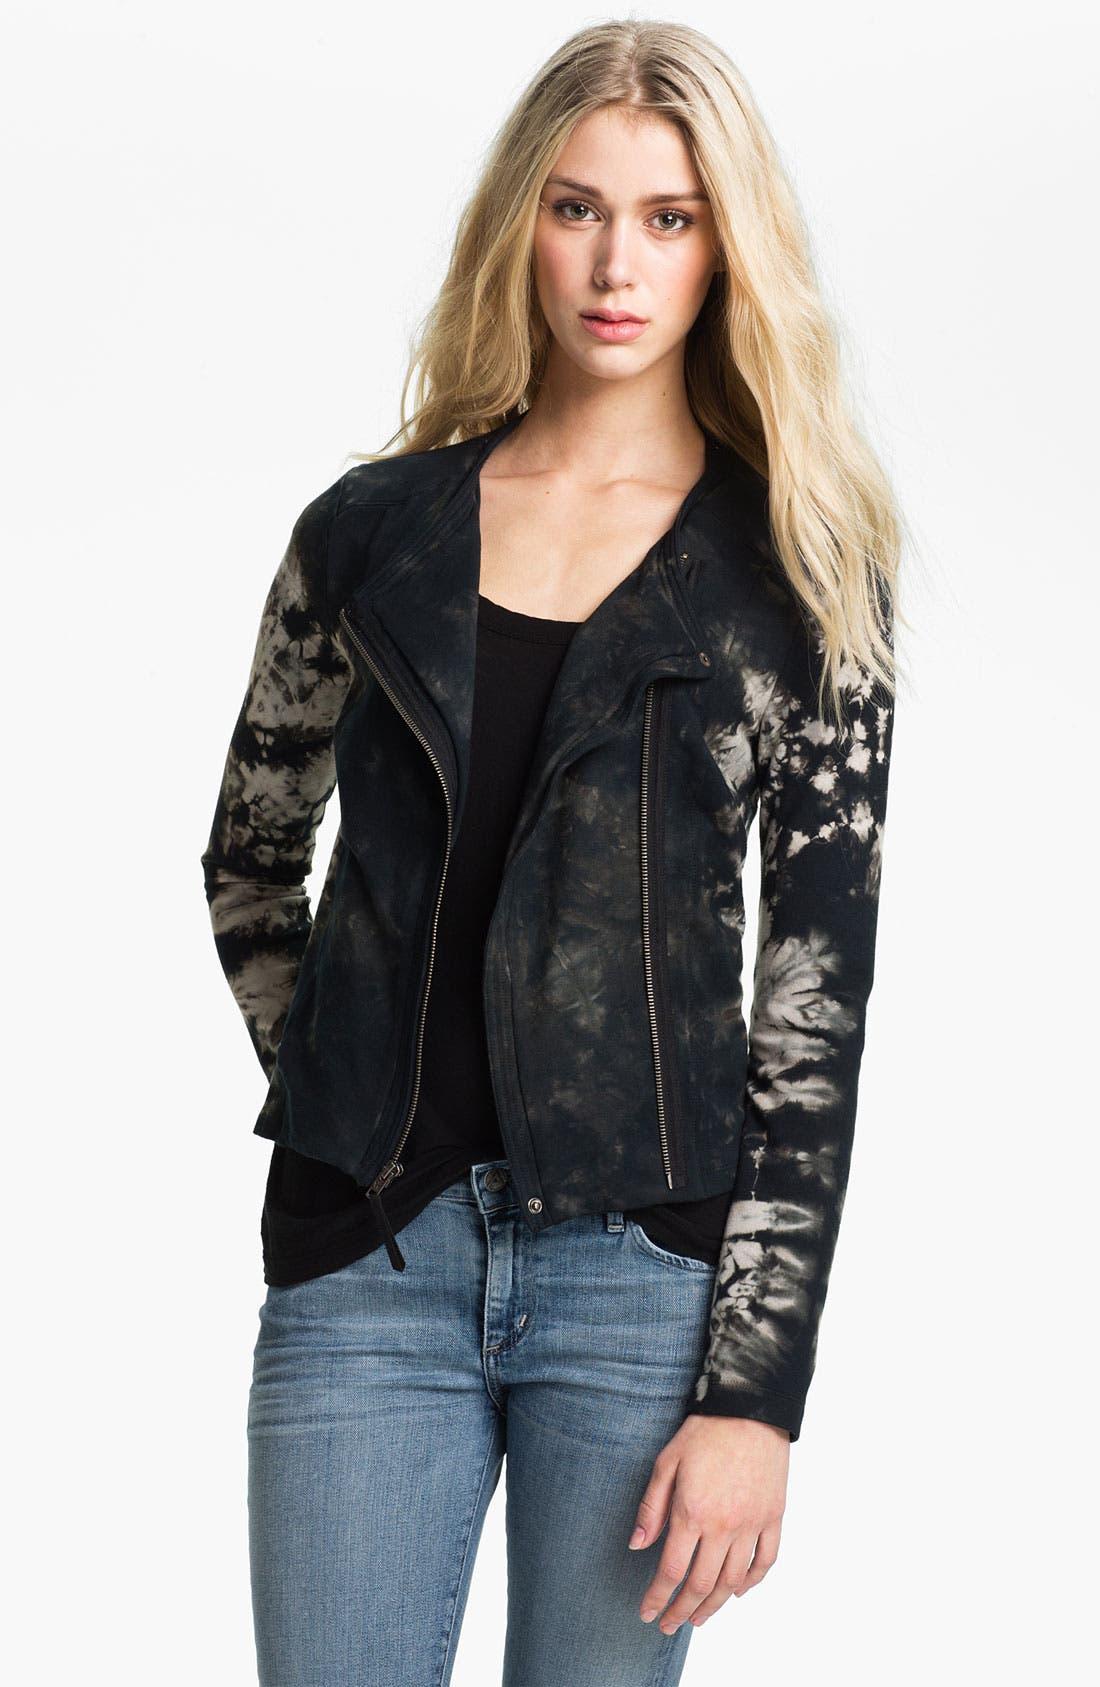 Alternate Image 1 Selected - Ella Moss 'Frankie' Tie Dyed Moto Jacket